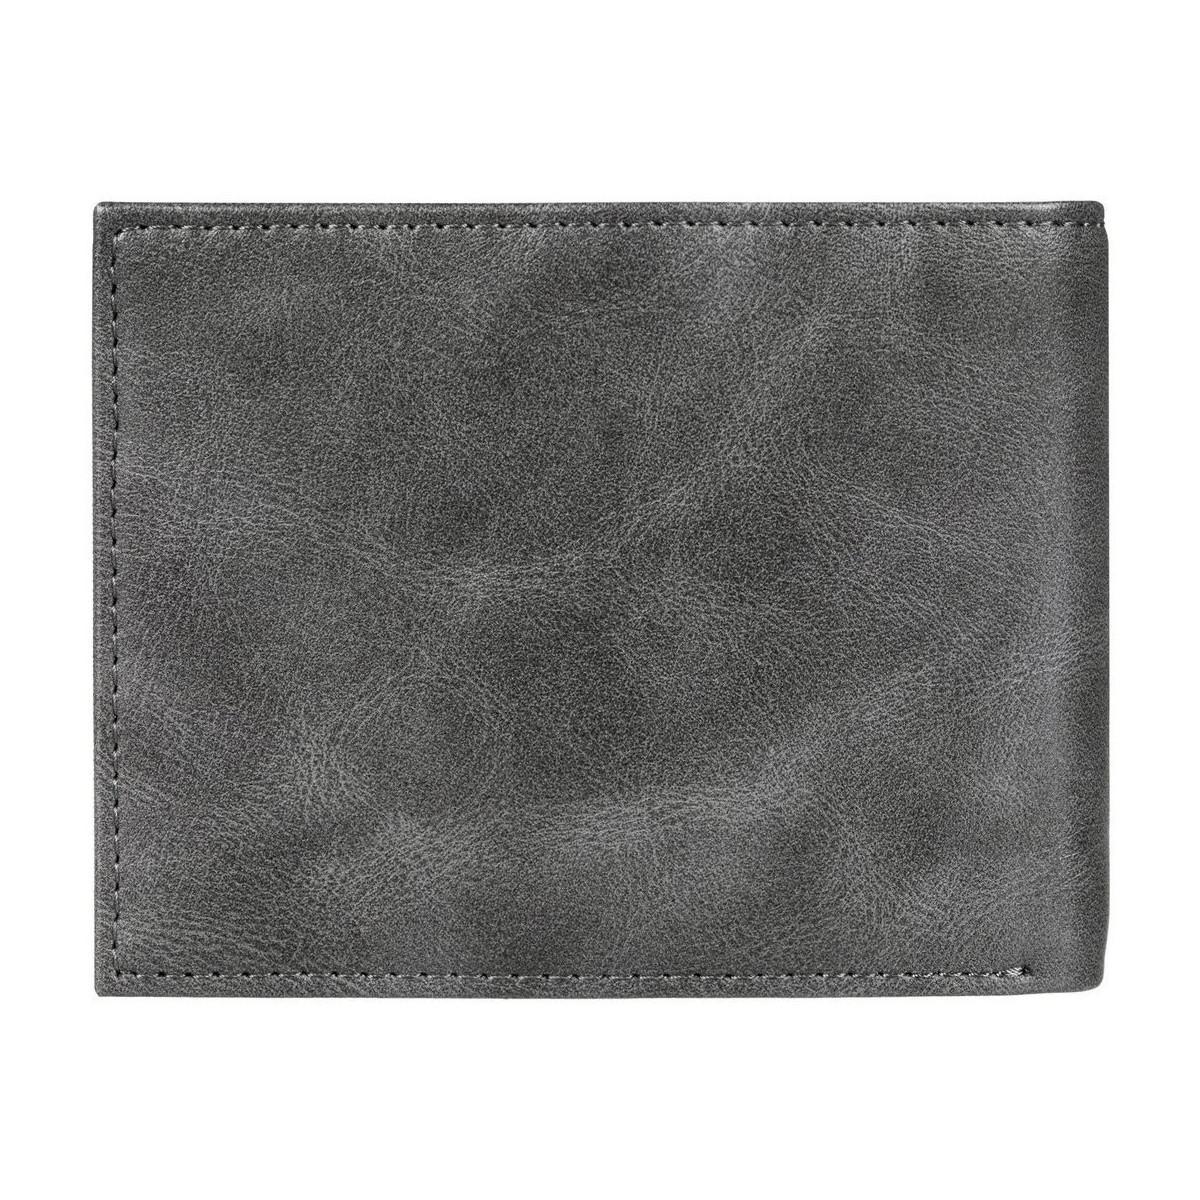 1a9a6299b Quiksilver Cartera Casual Hombre Stitch Men's Purse Wallet In Grey ...